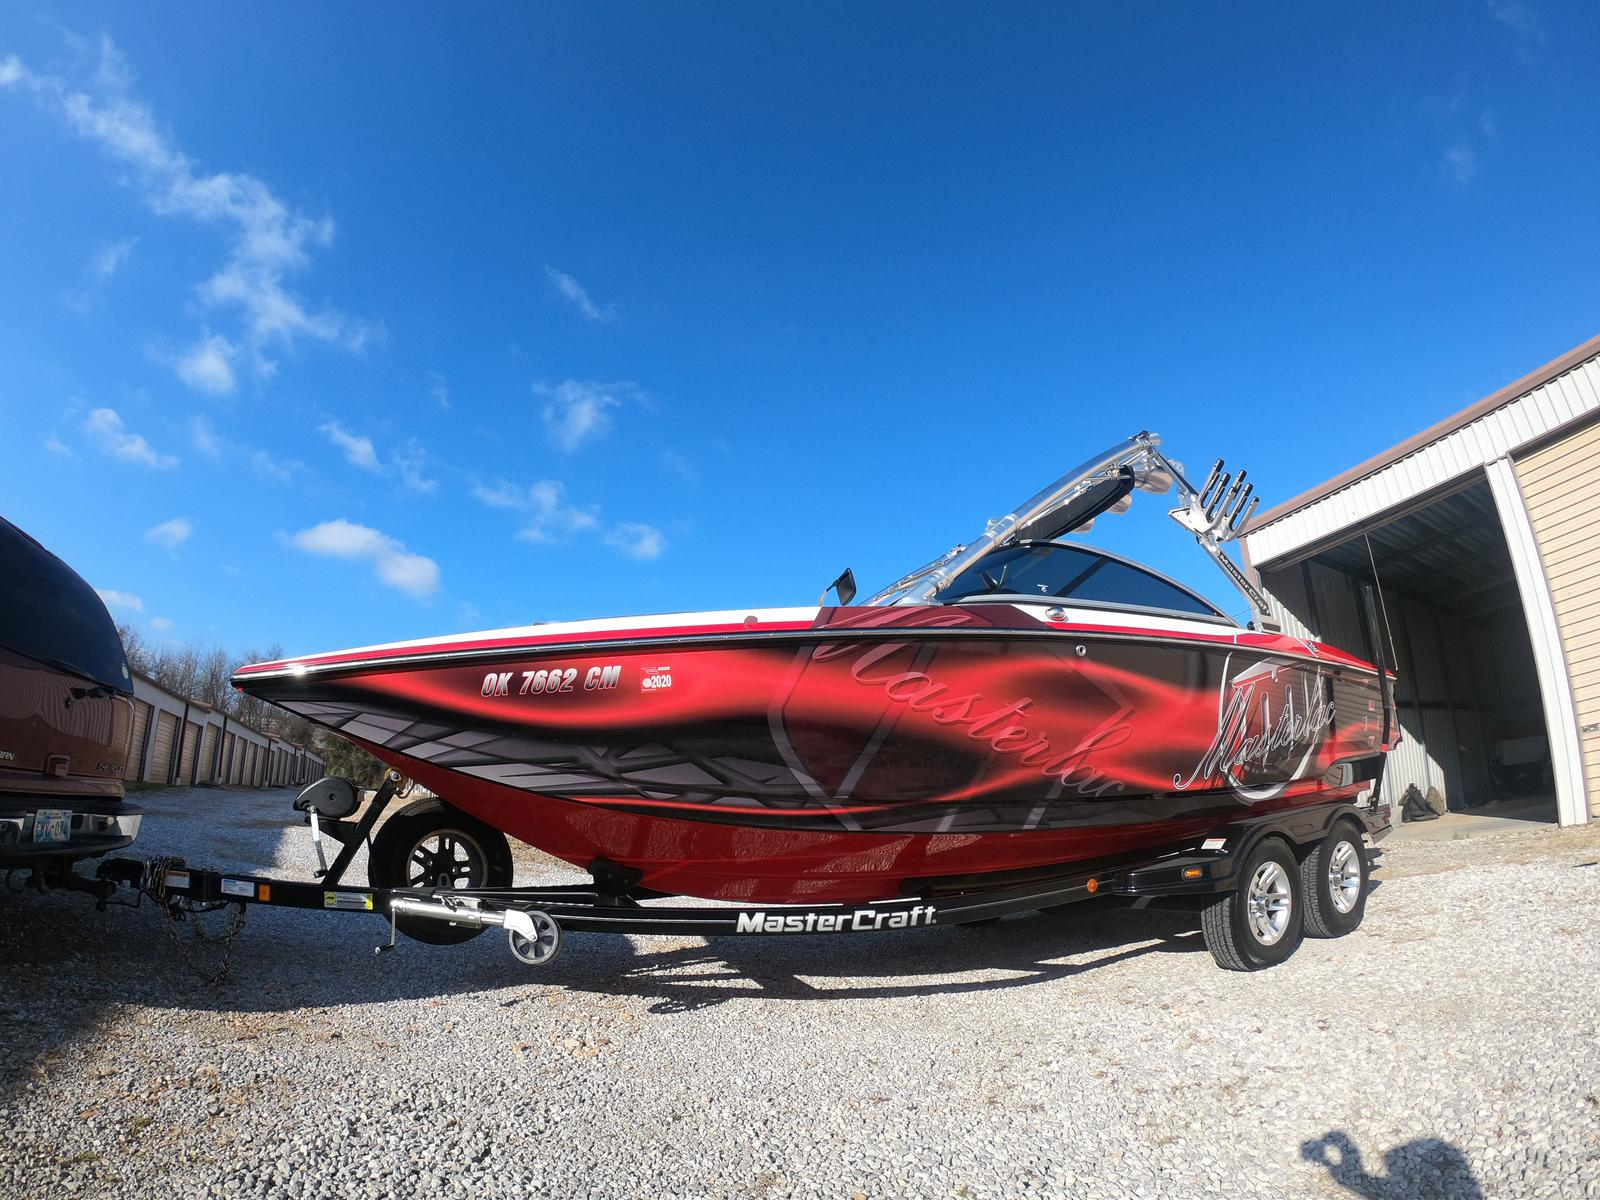 Inventory Arrowhead Boat Sales & Yacht Club